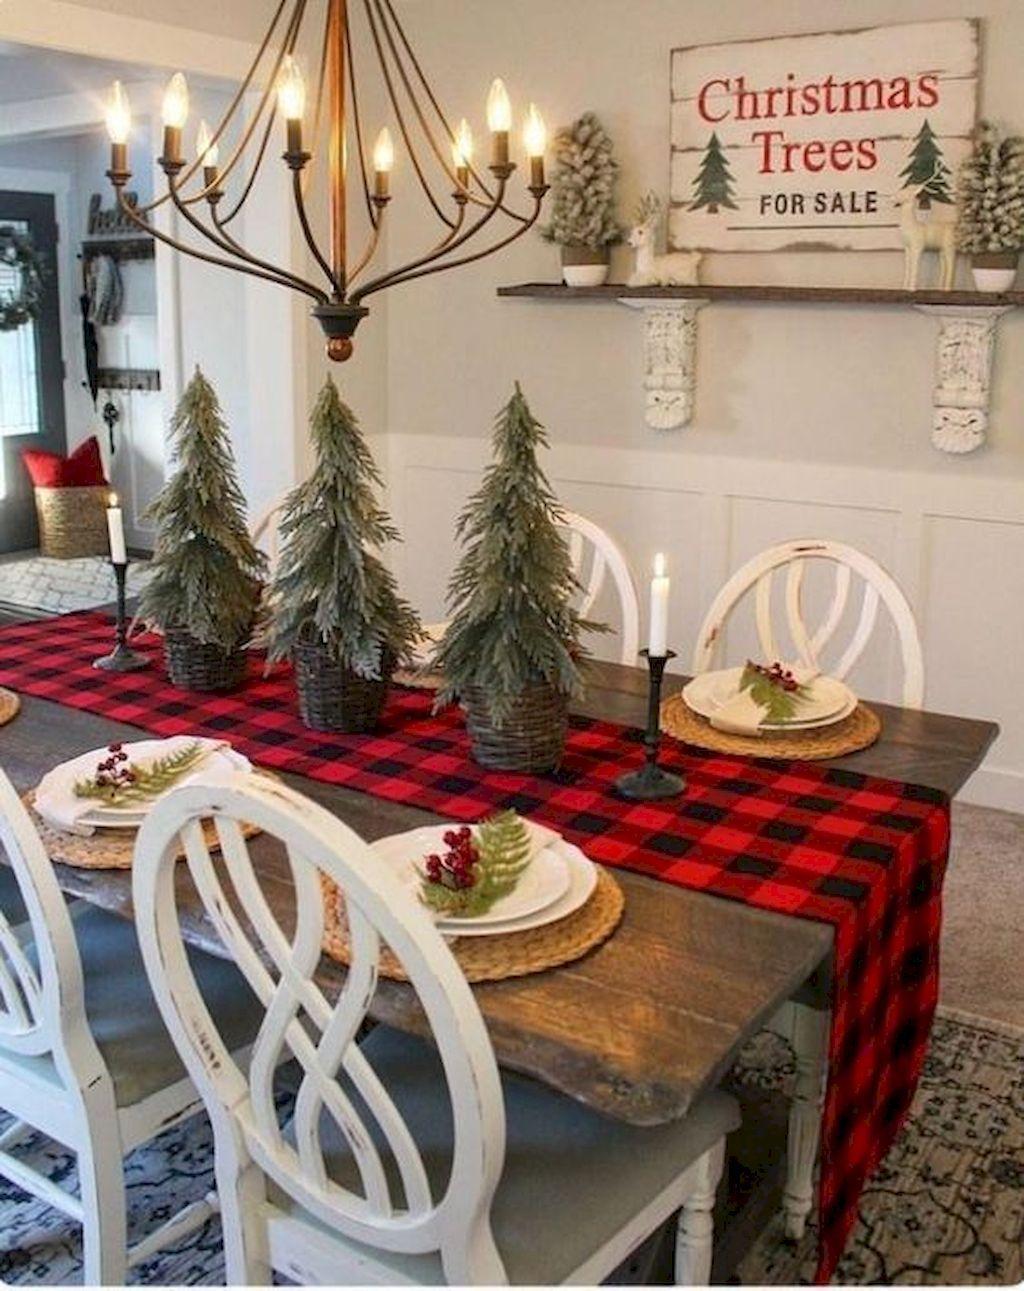 Awesome rustic farmhouse christmas light decor ideas source link https doitdecor also diy craft  rv rh pinterest